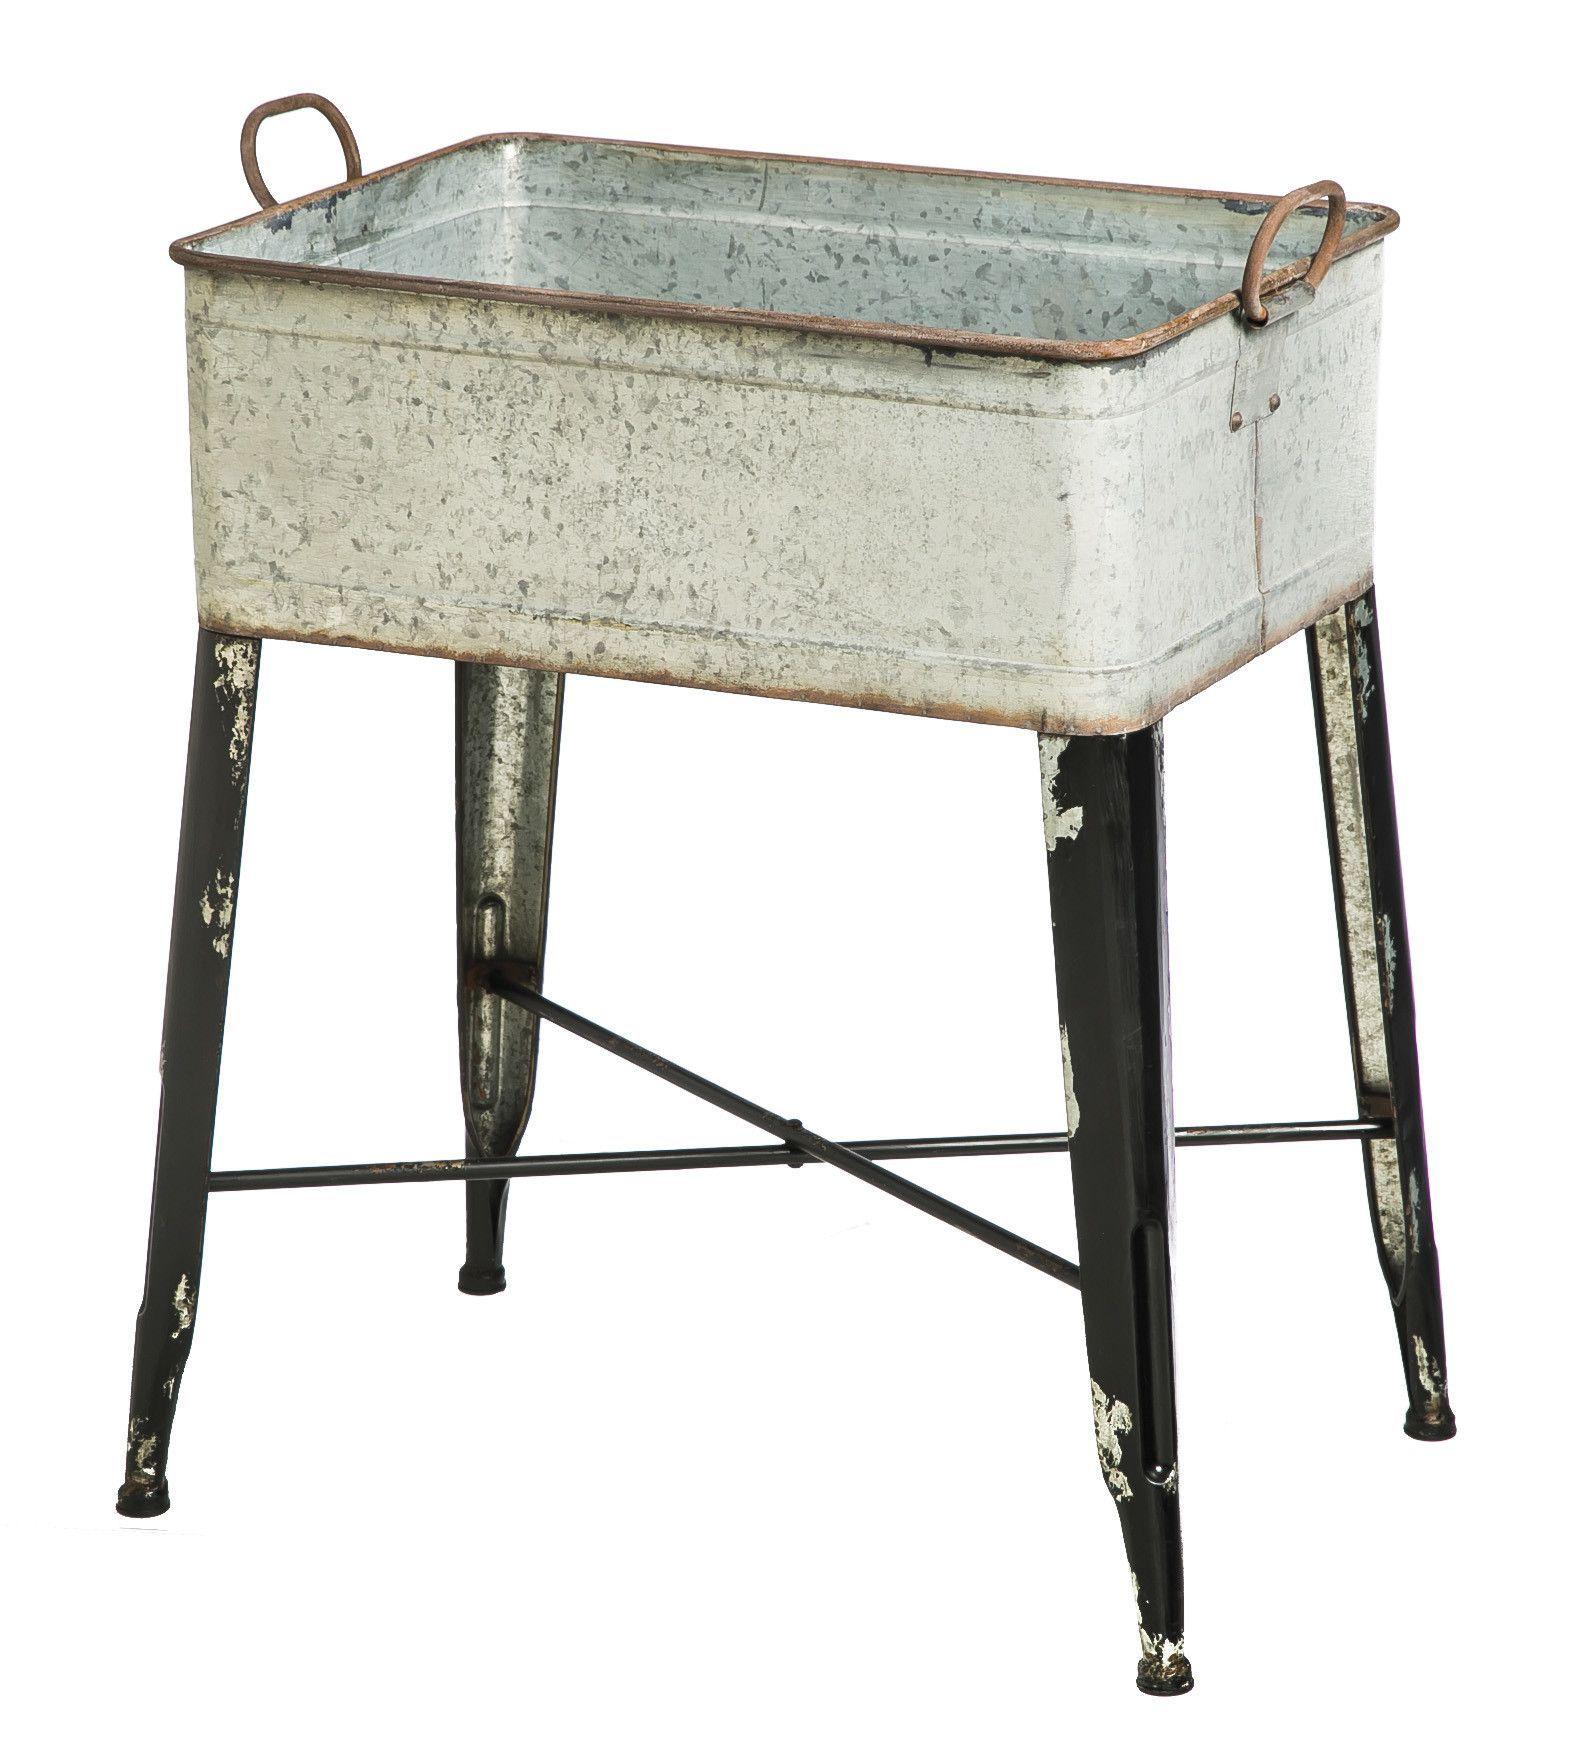 Evergreen Enterprises Inc Novelty Plant Stand Metal Wash Tub Wash Tub Sink Wash Tubs